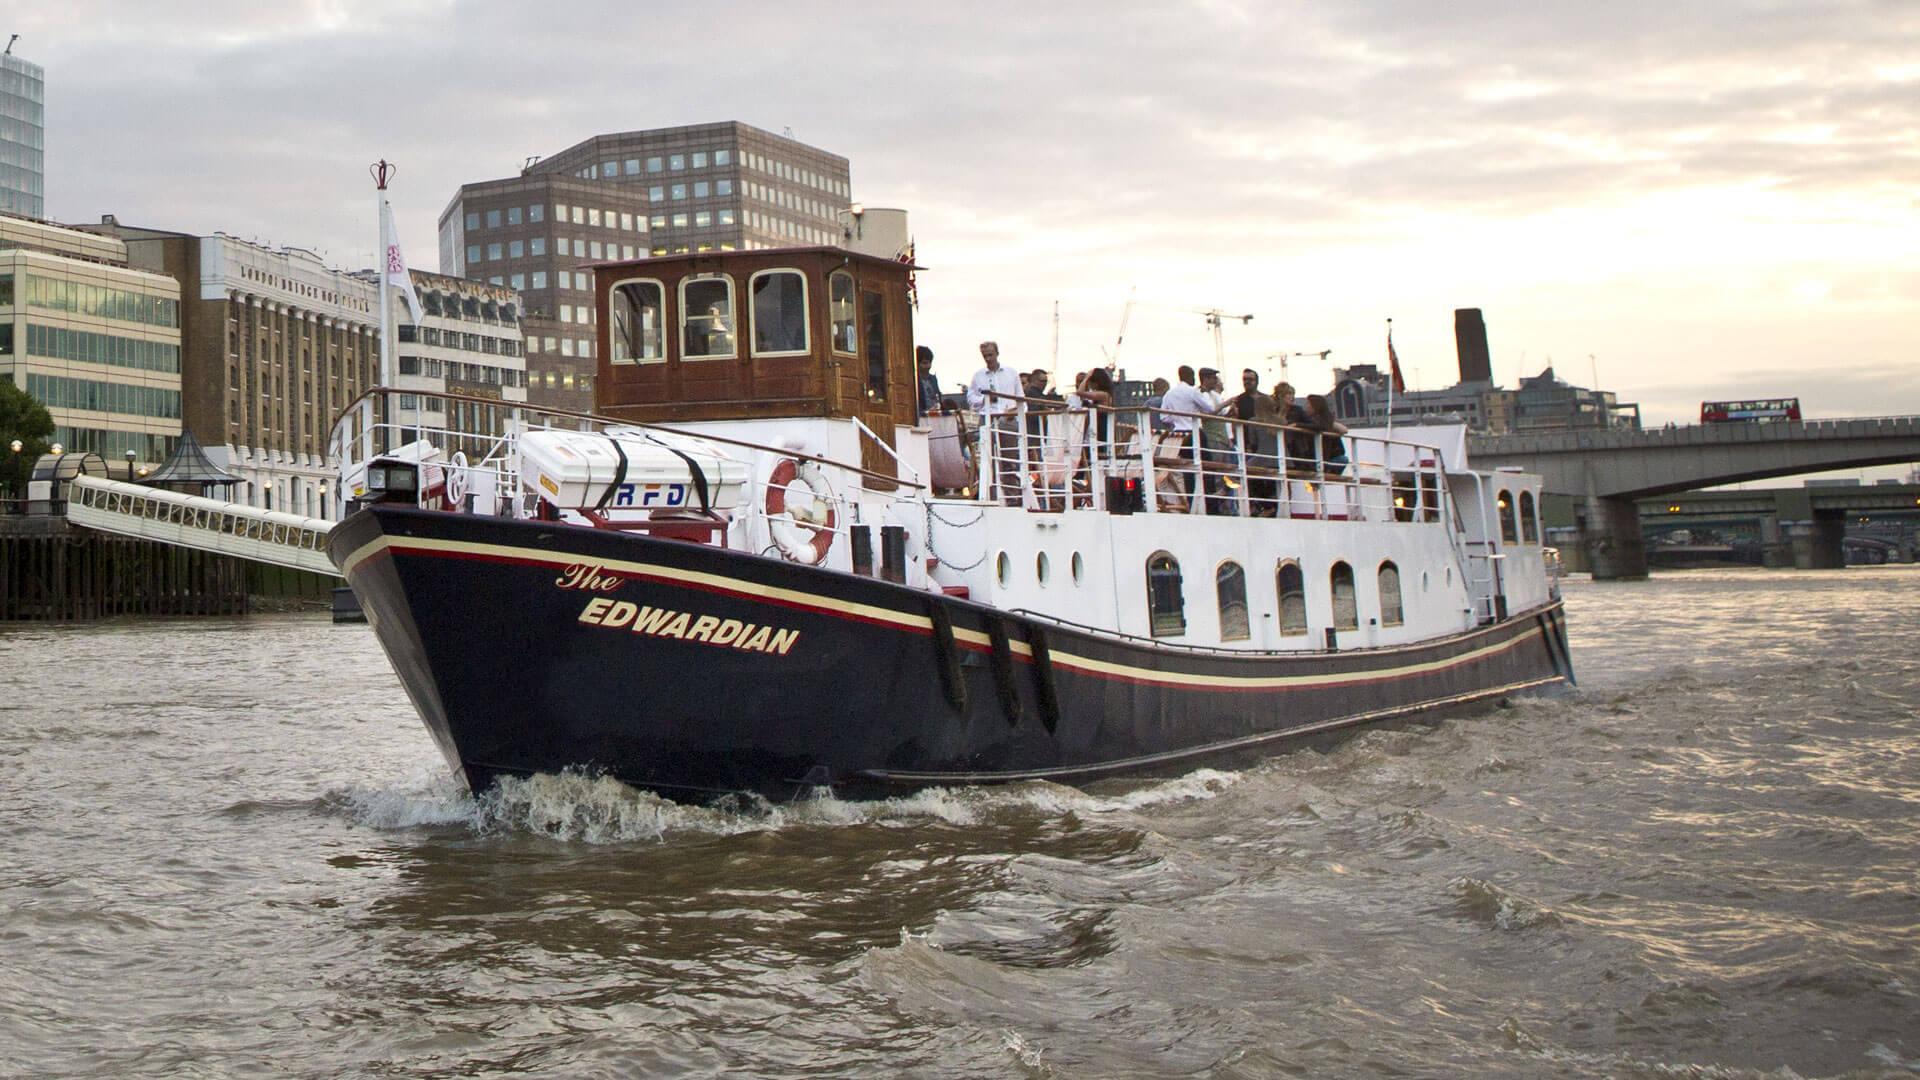 New Year's Eve Thames Cruise 2017 - Dinner & Fireworks